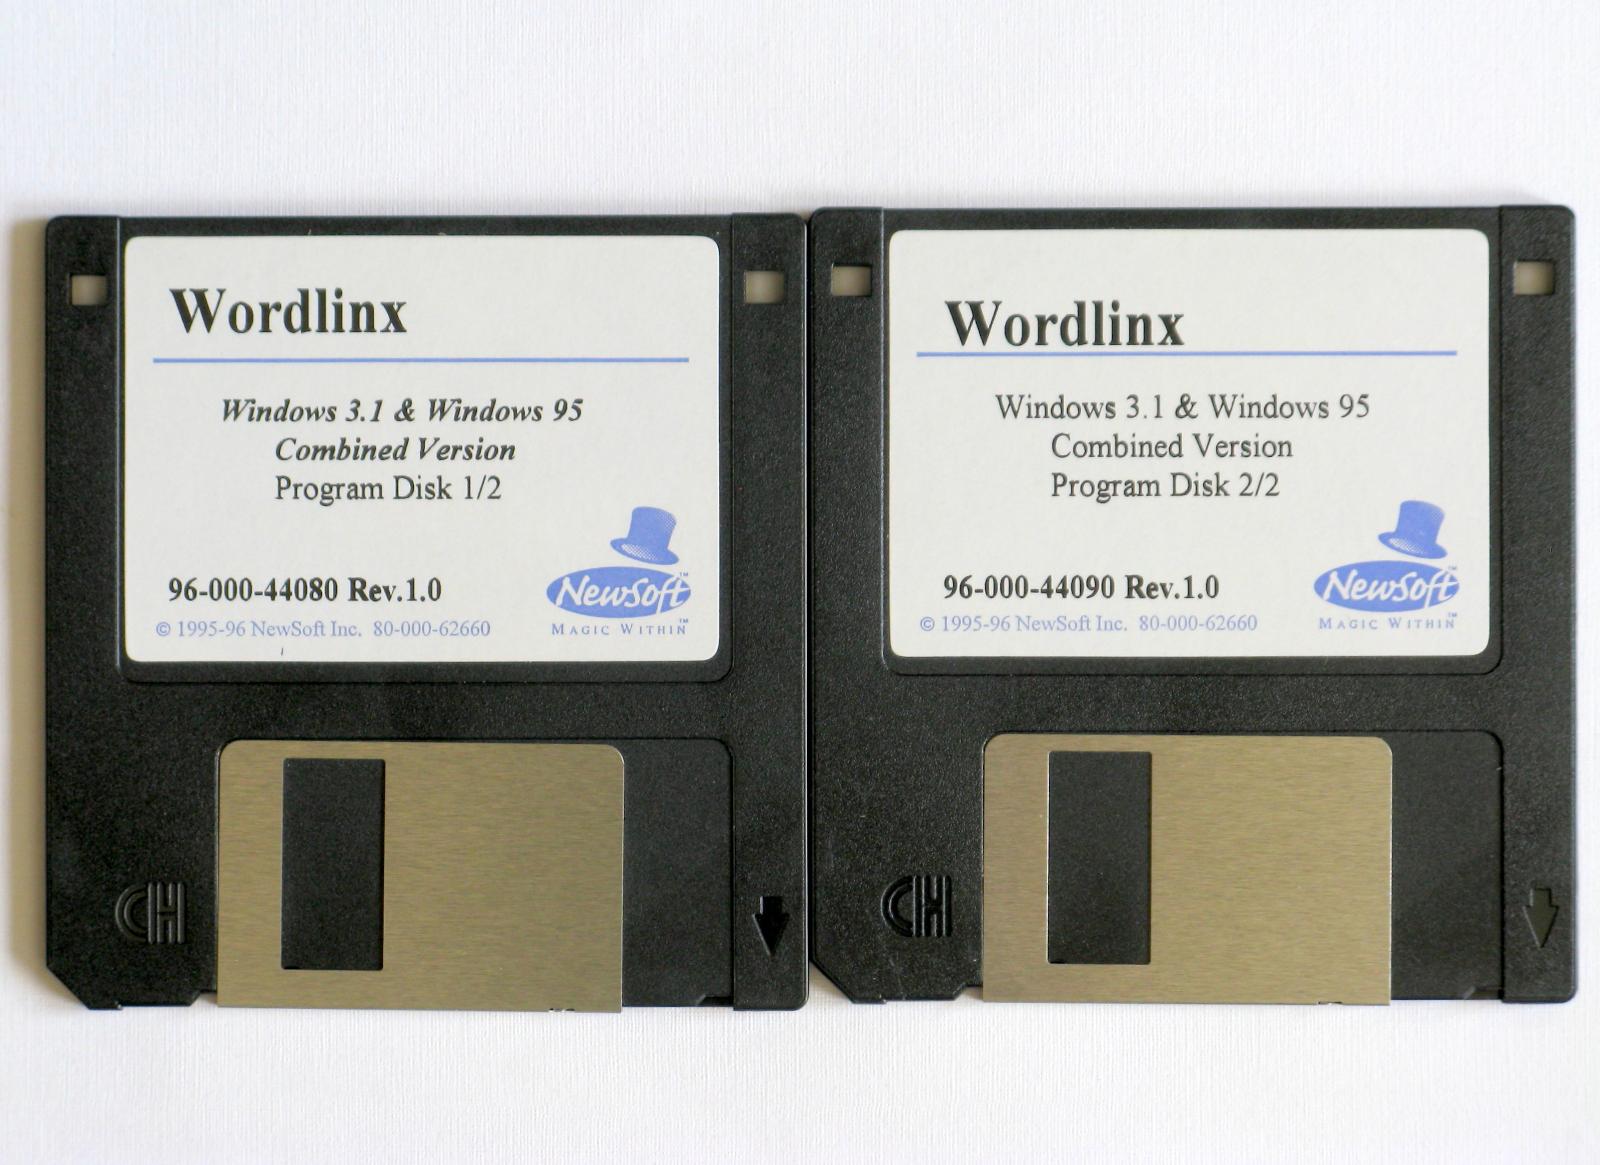 Vintage Wordlinx OCR Software for Windows 3.1 and Windows 95, 96-000-44080